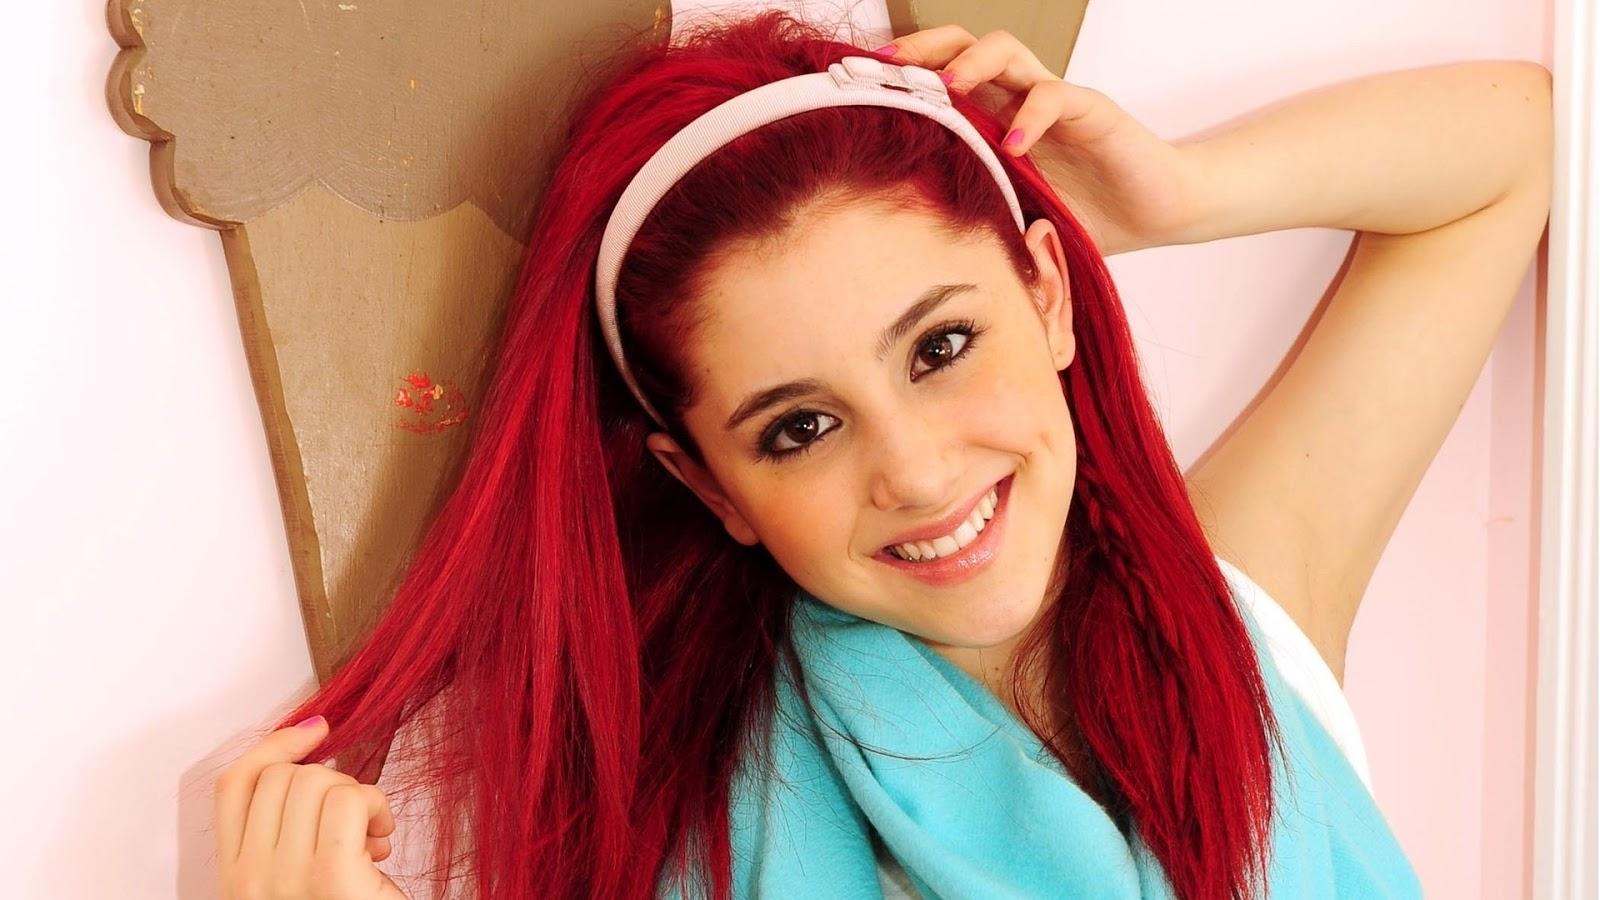 Piano - Ariana Grande - VAGALUME